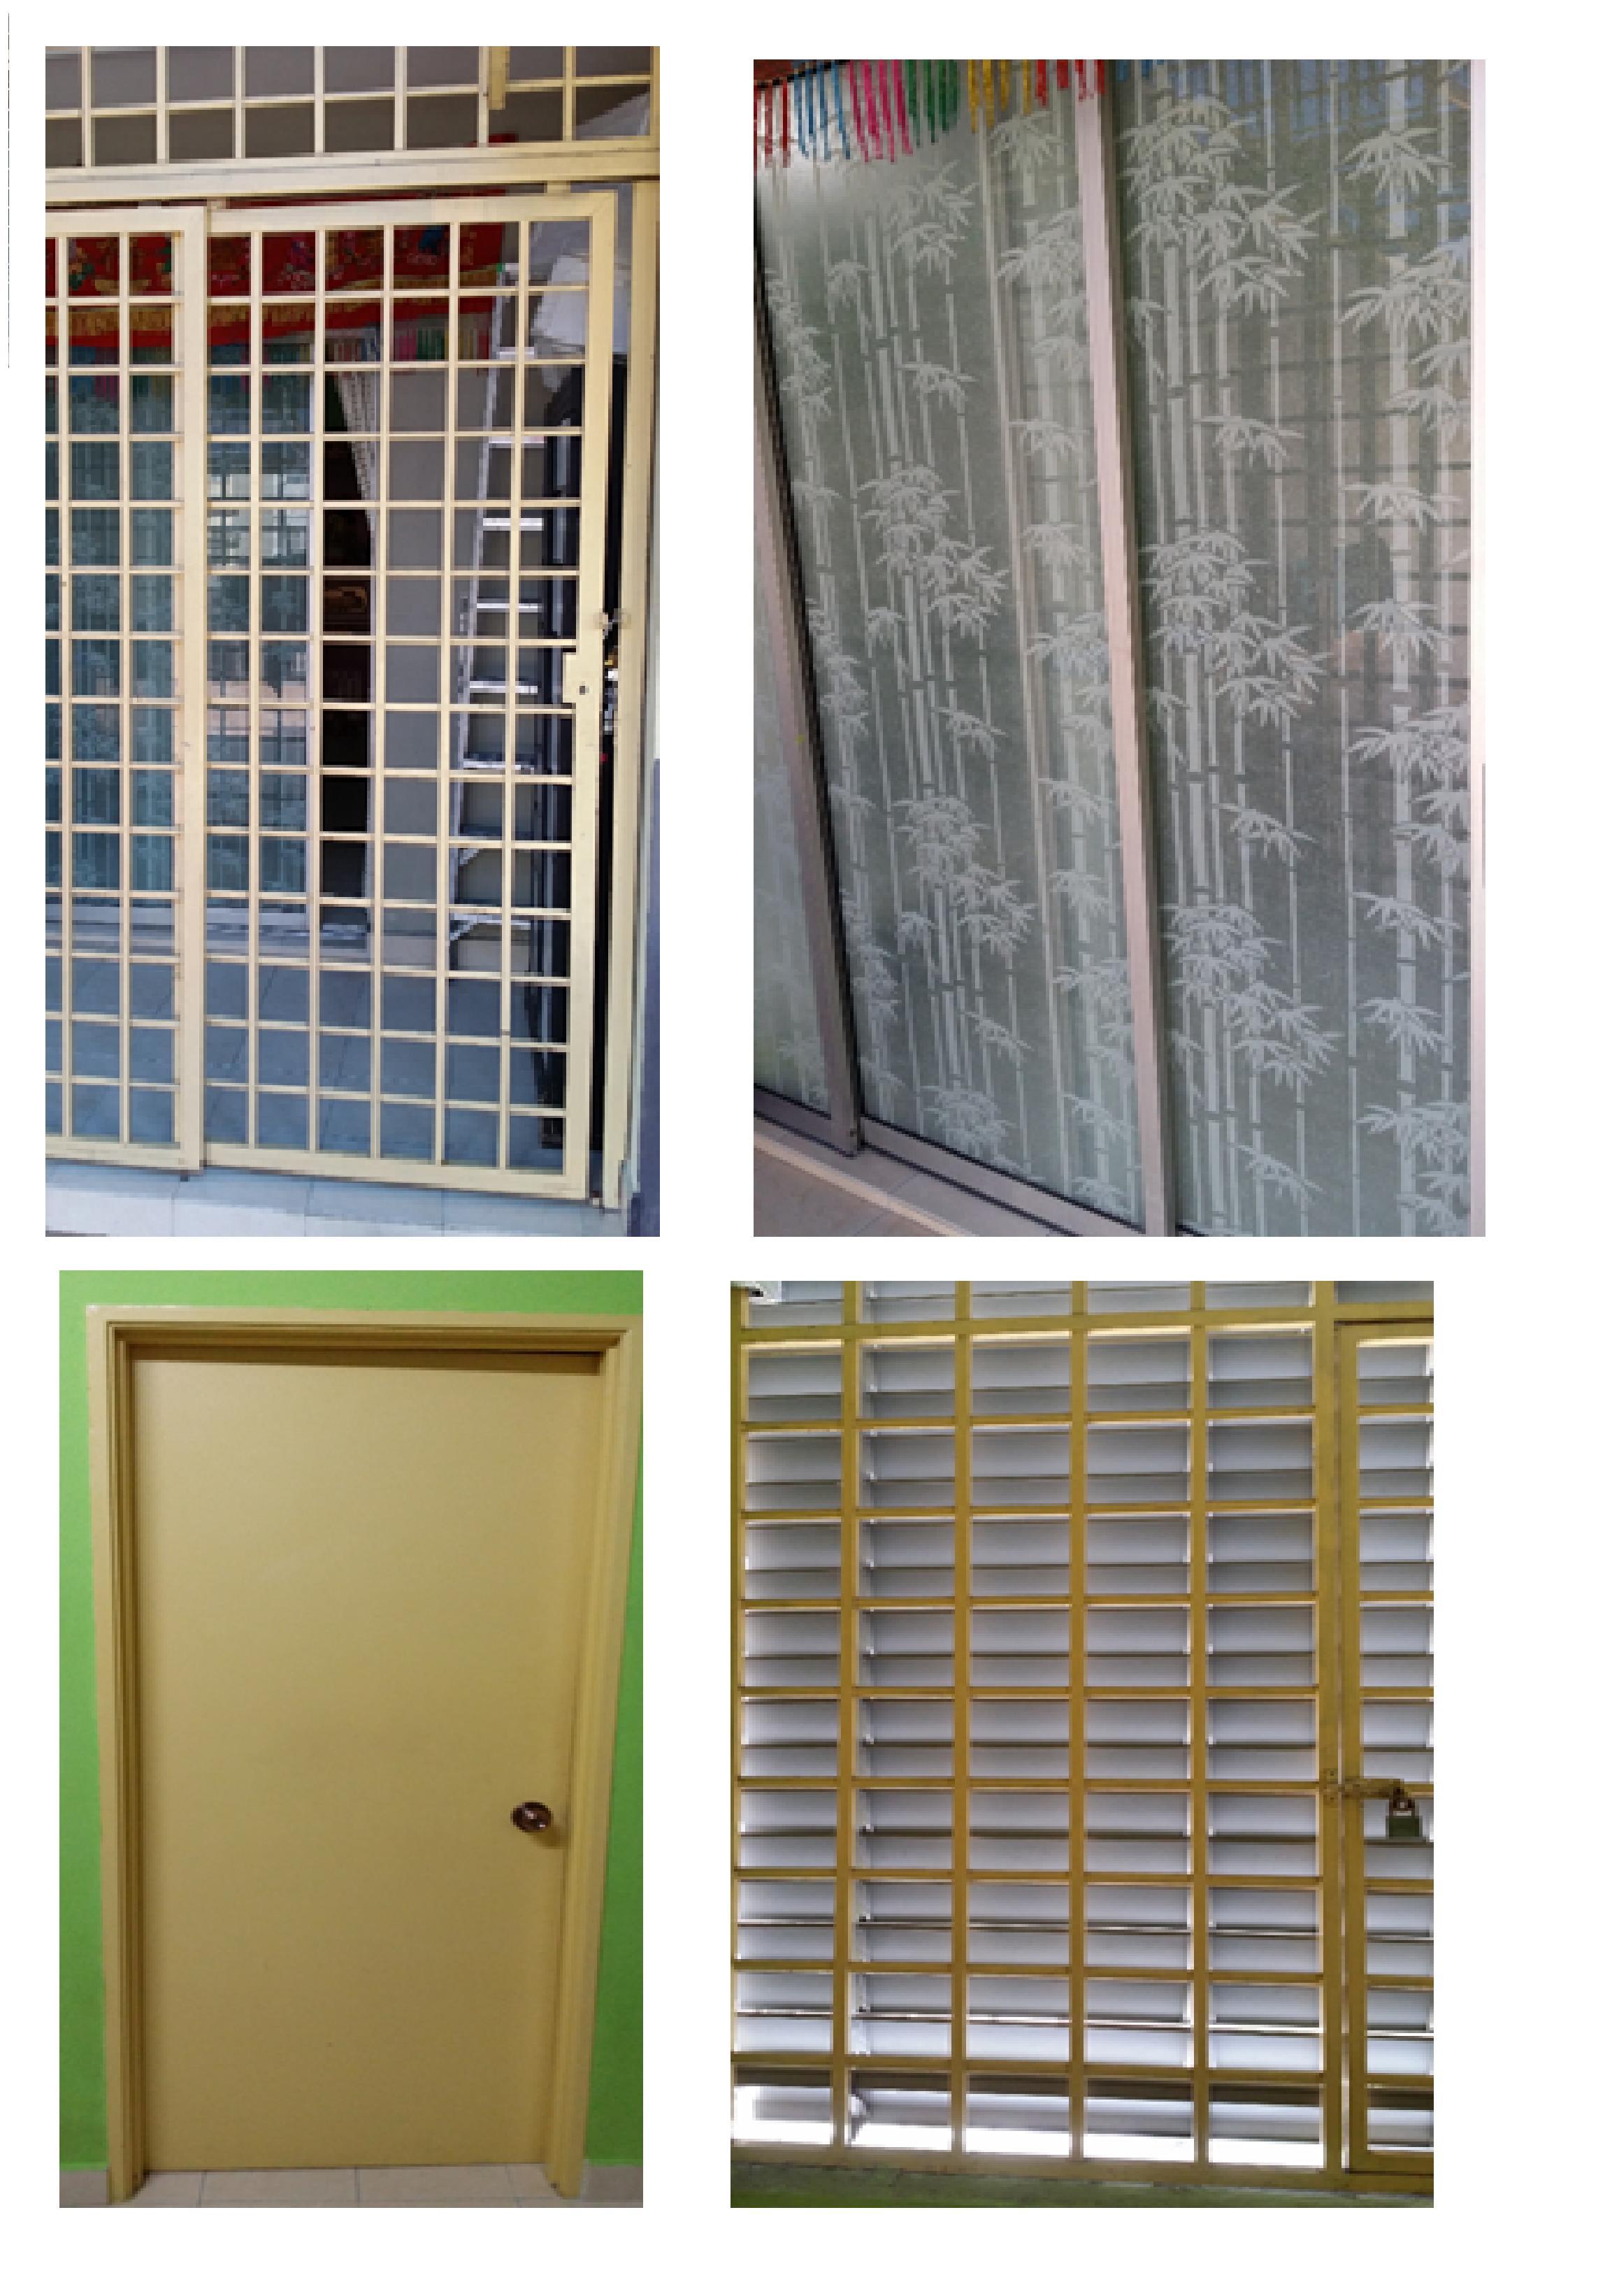 MS Grill Sliding Door Cabinet.  sc 1 st  Secondhand.my & MS Grill Sliding Door Cabinet... | Secondhand.my